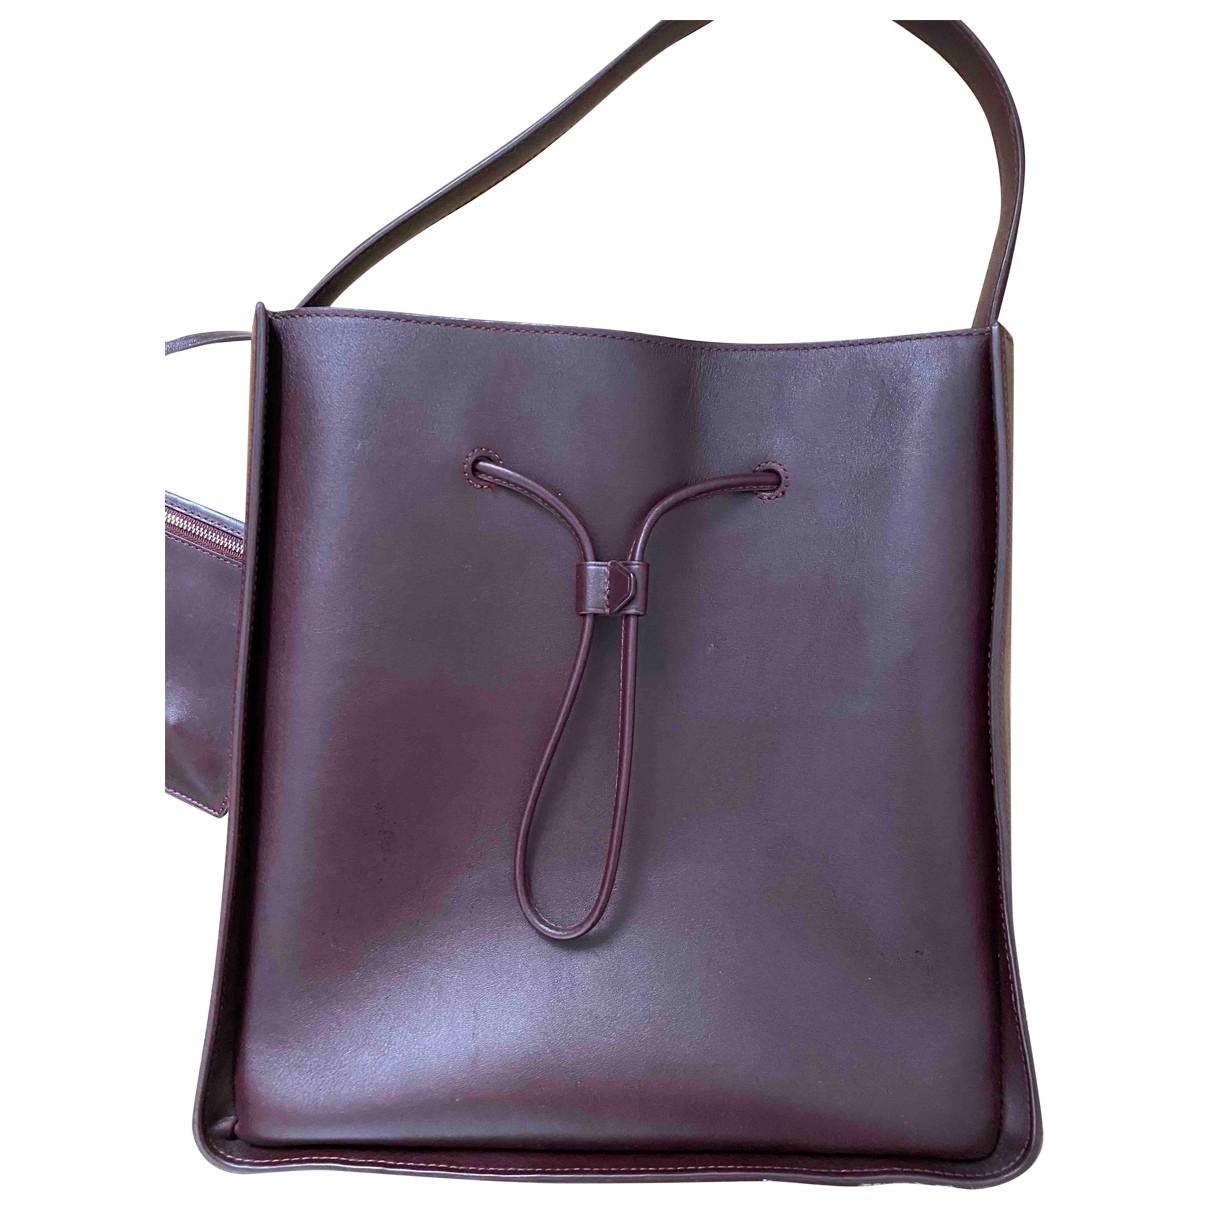 3.1 Phillip Lim \N Handtasche in  Bordeauxrot Leder